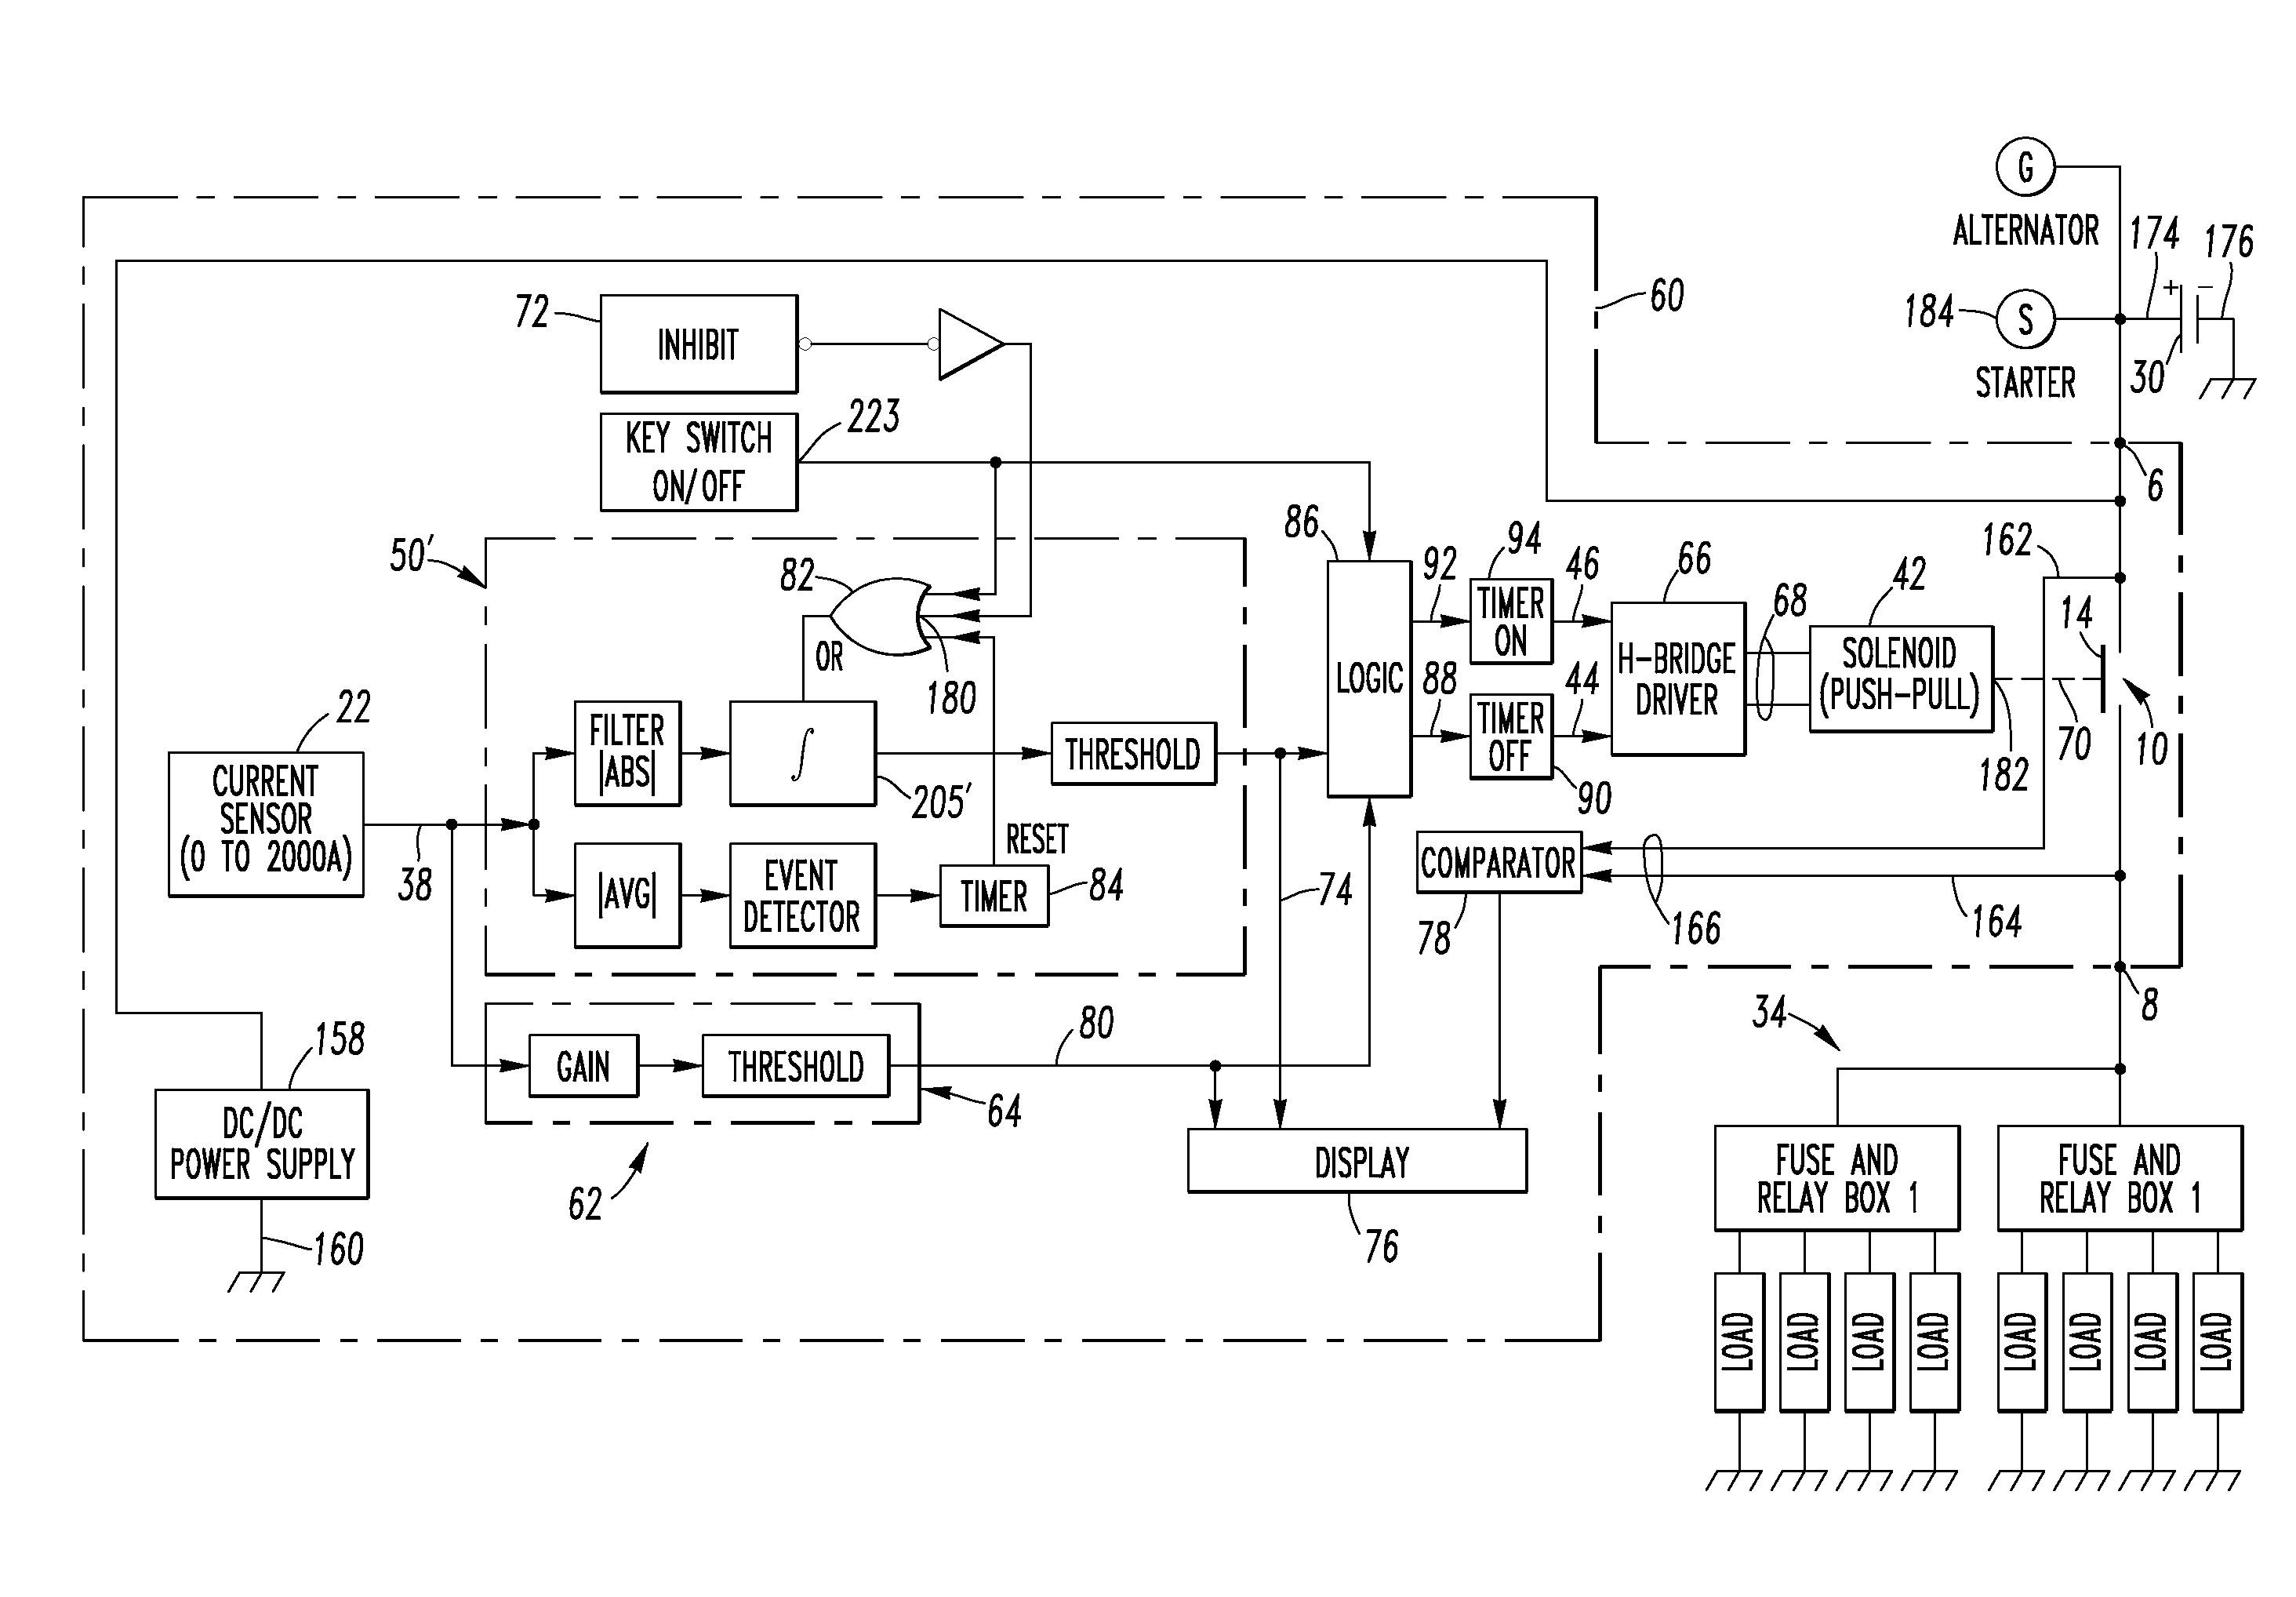 Intellitec Battery Control Center Wiring Diagram Database